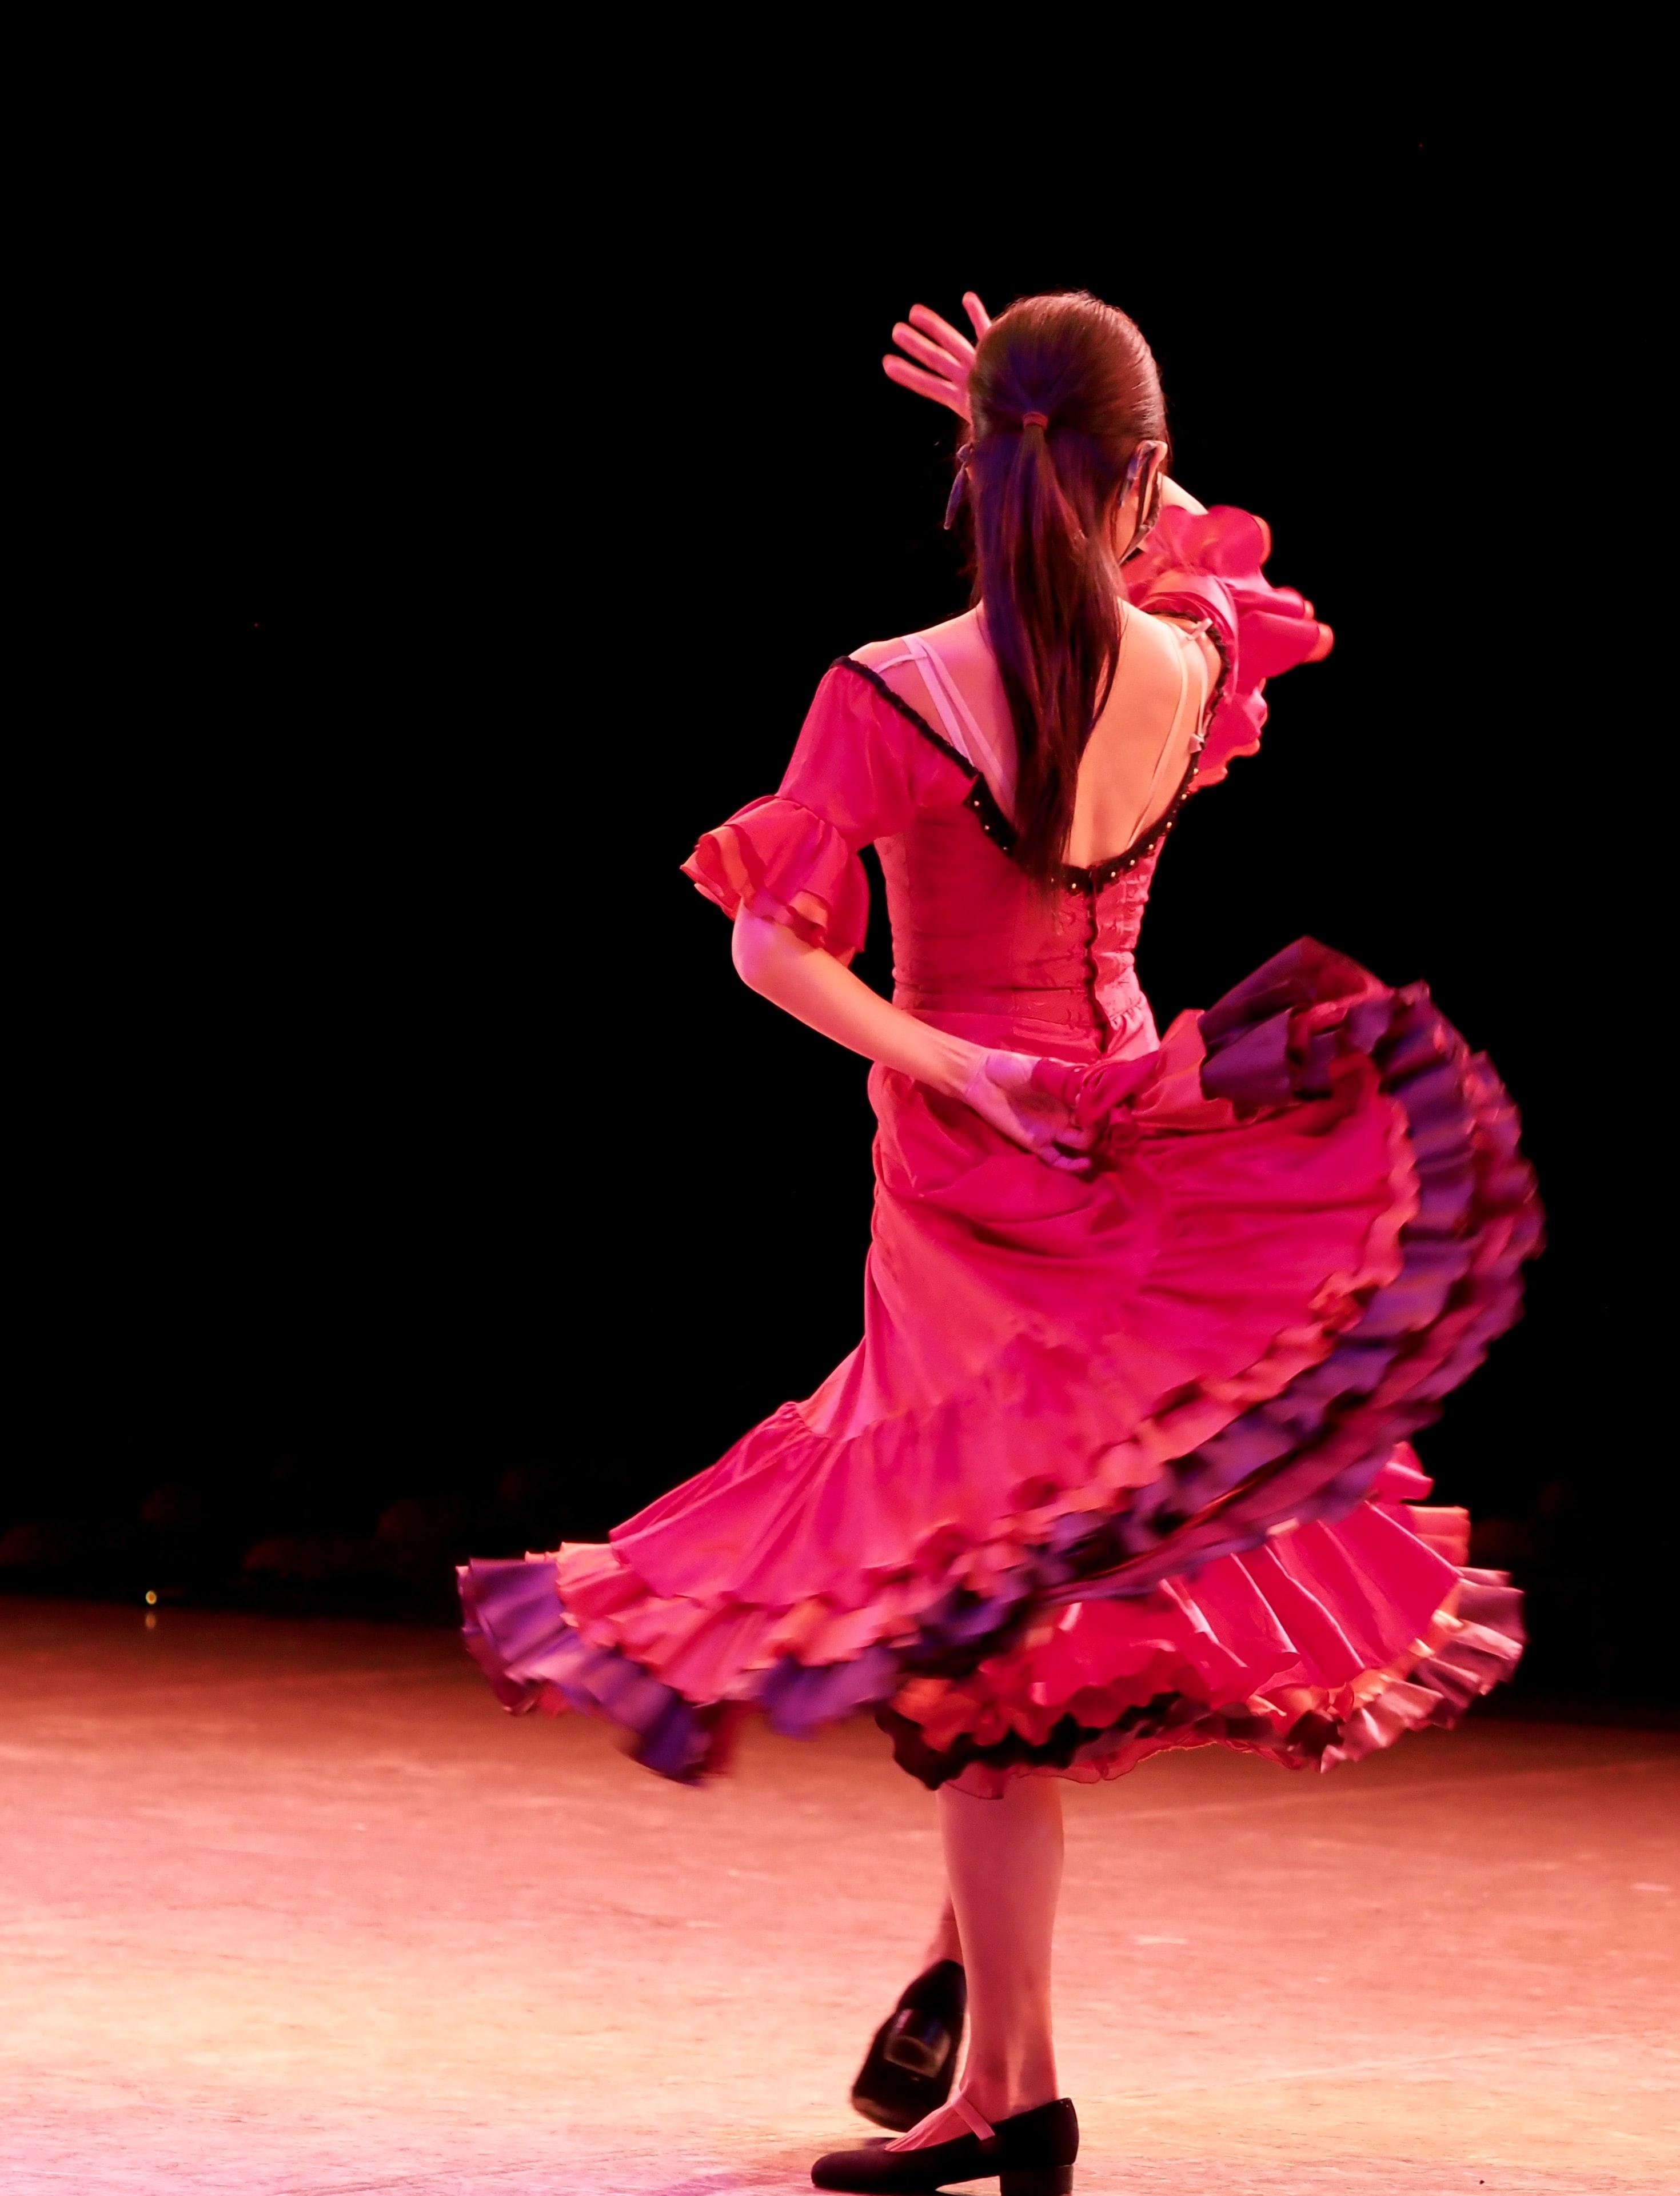 Flamenco dancer dancing on stage